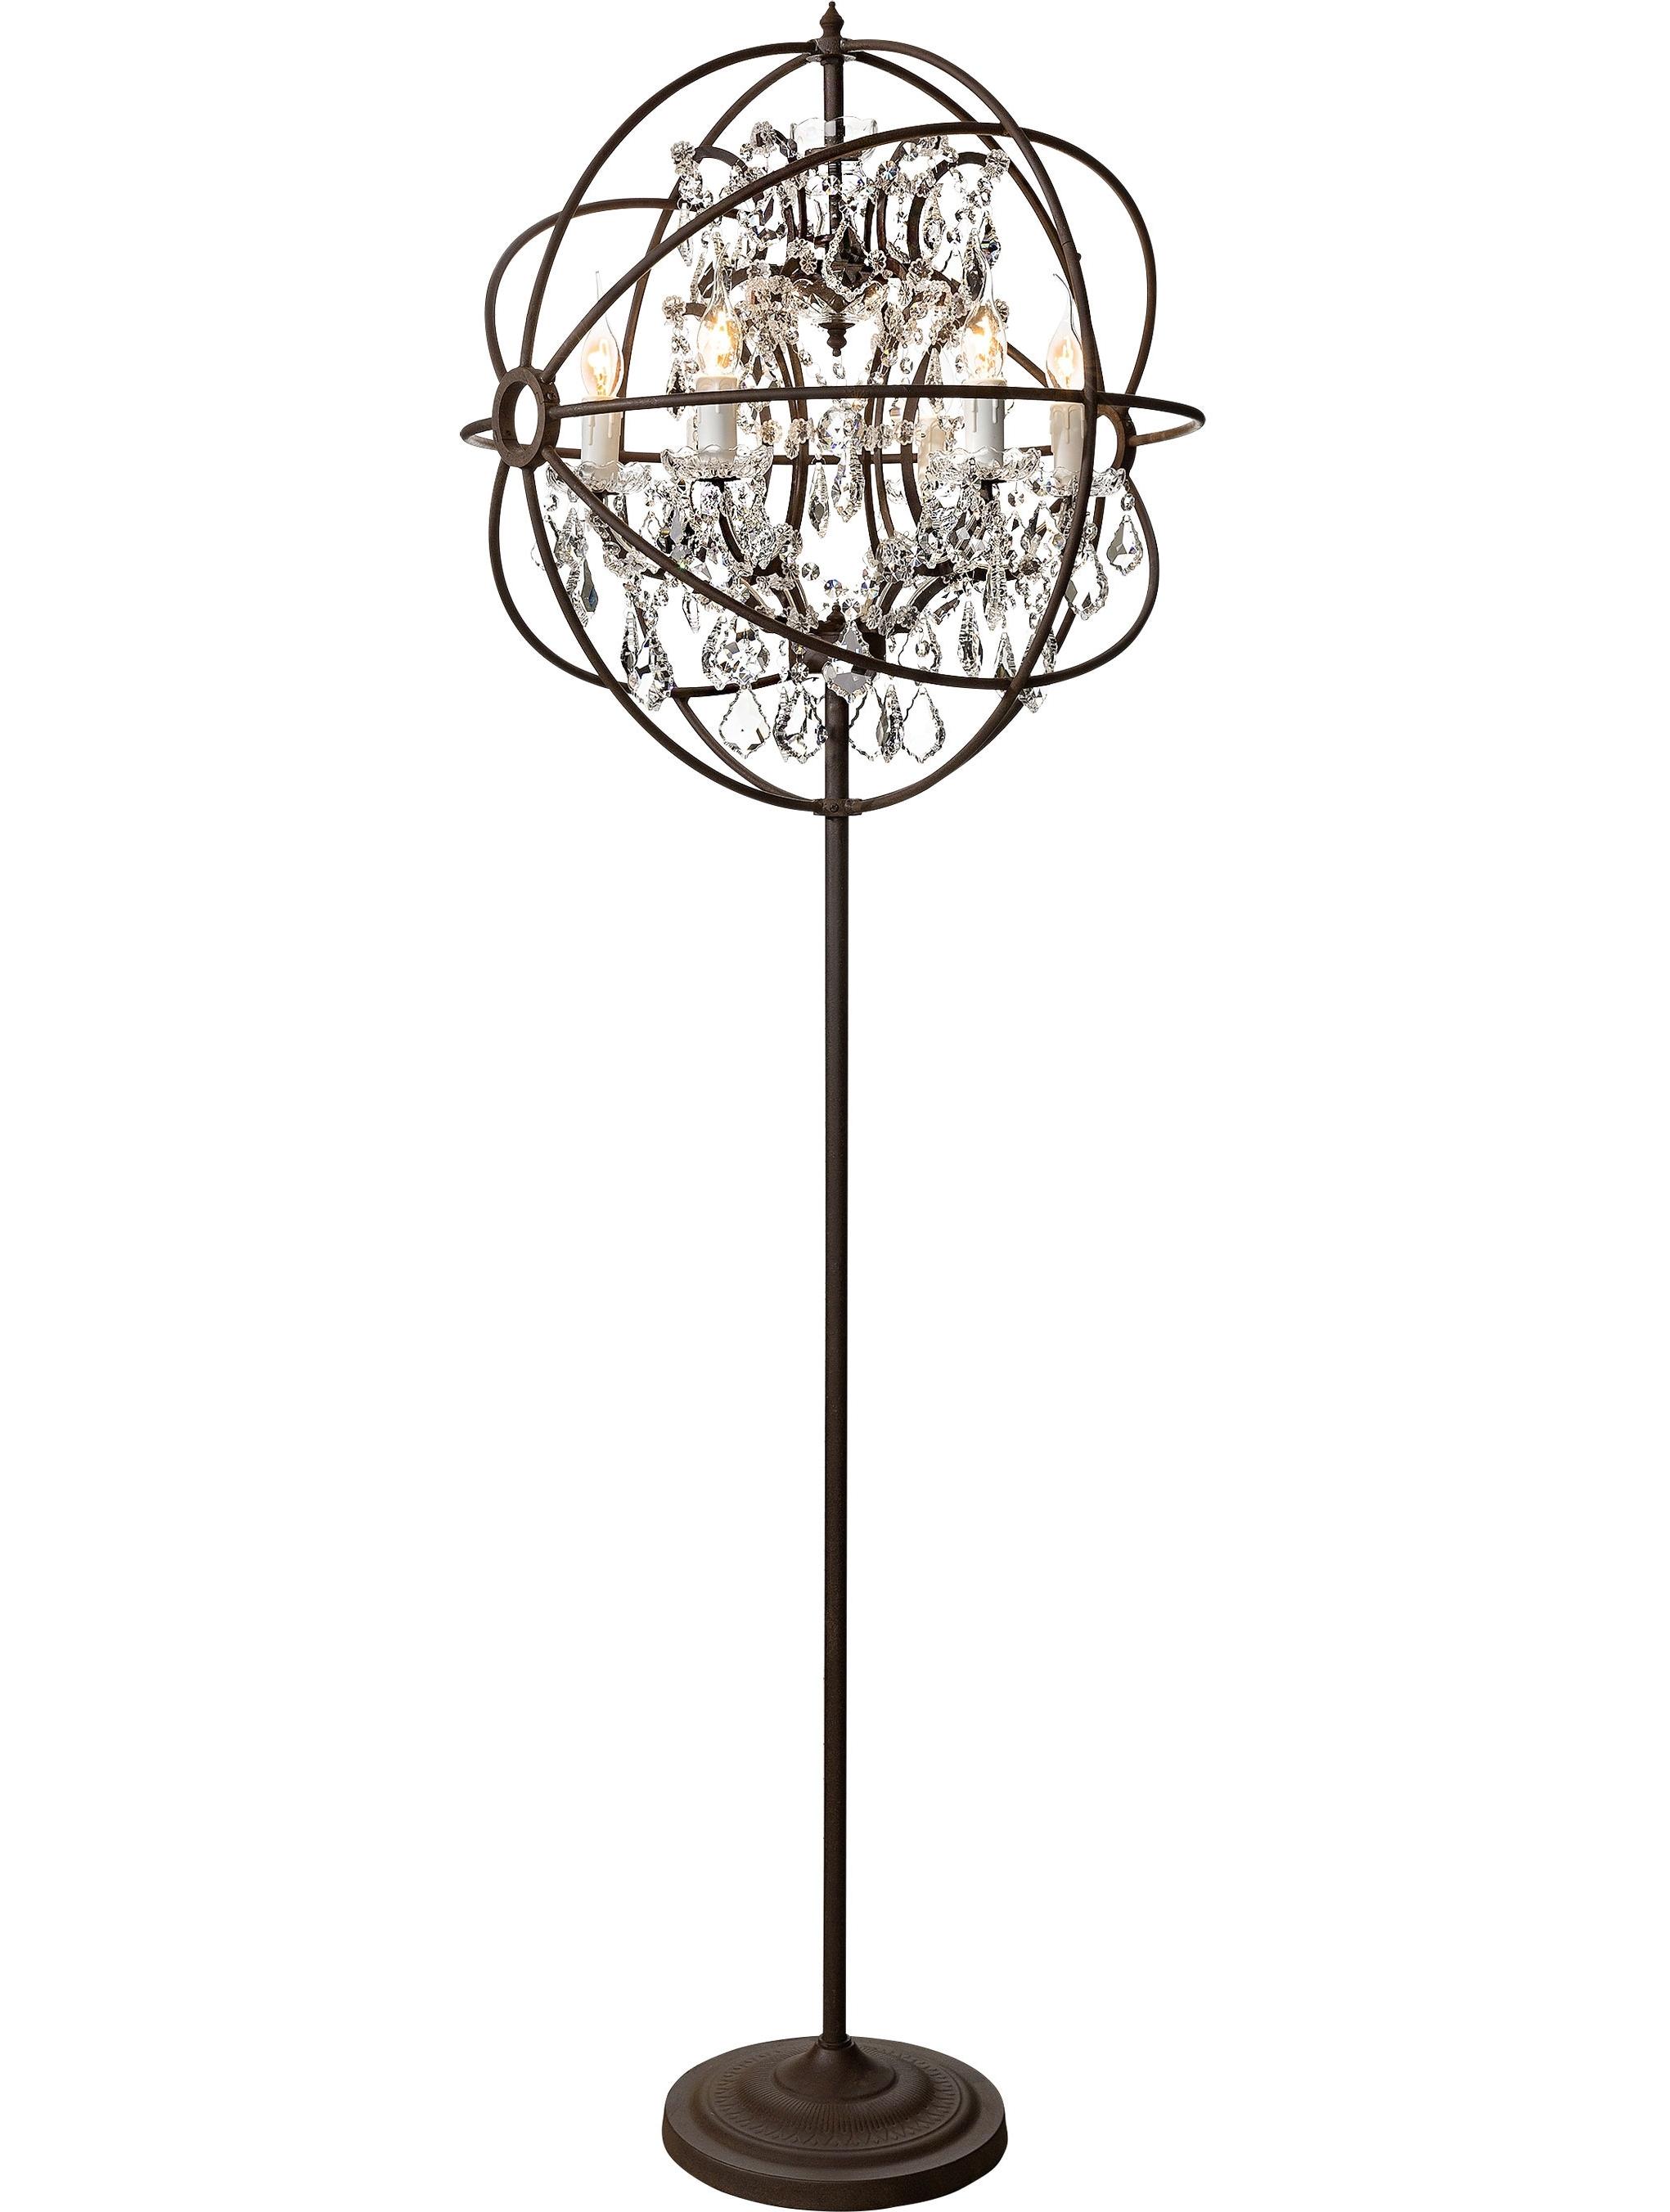 2018 Chandeliers Design : Wonderful Creative Floor Chandelier Lighting On For Chandelier Standing Lamps (View 6 of 20)